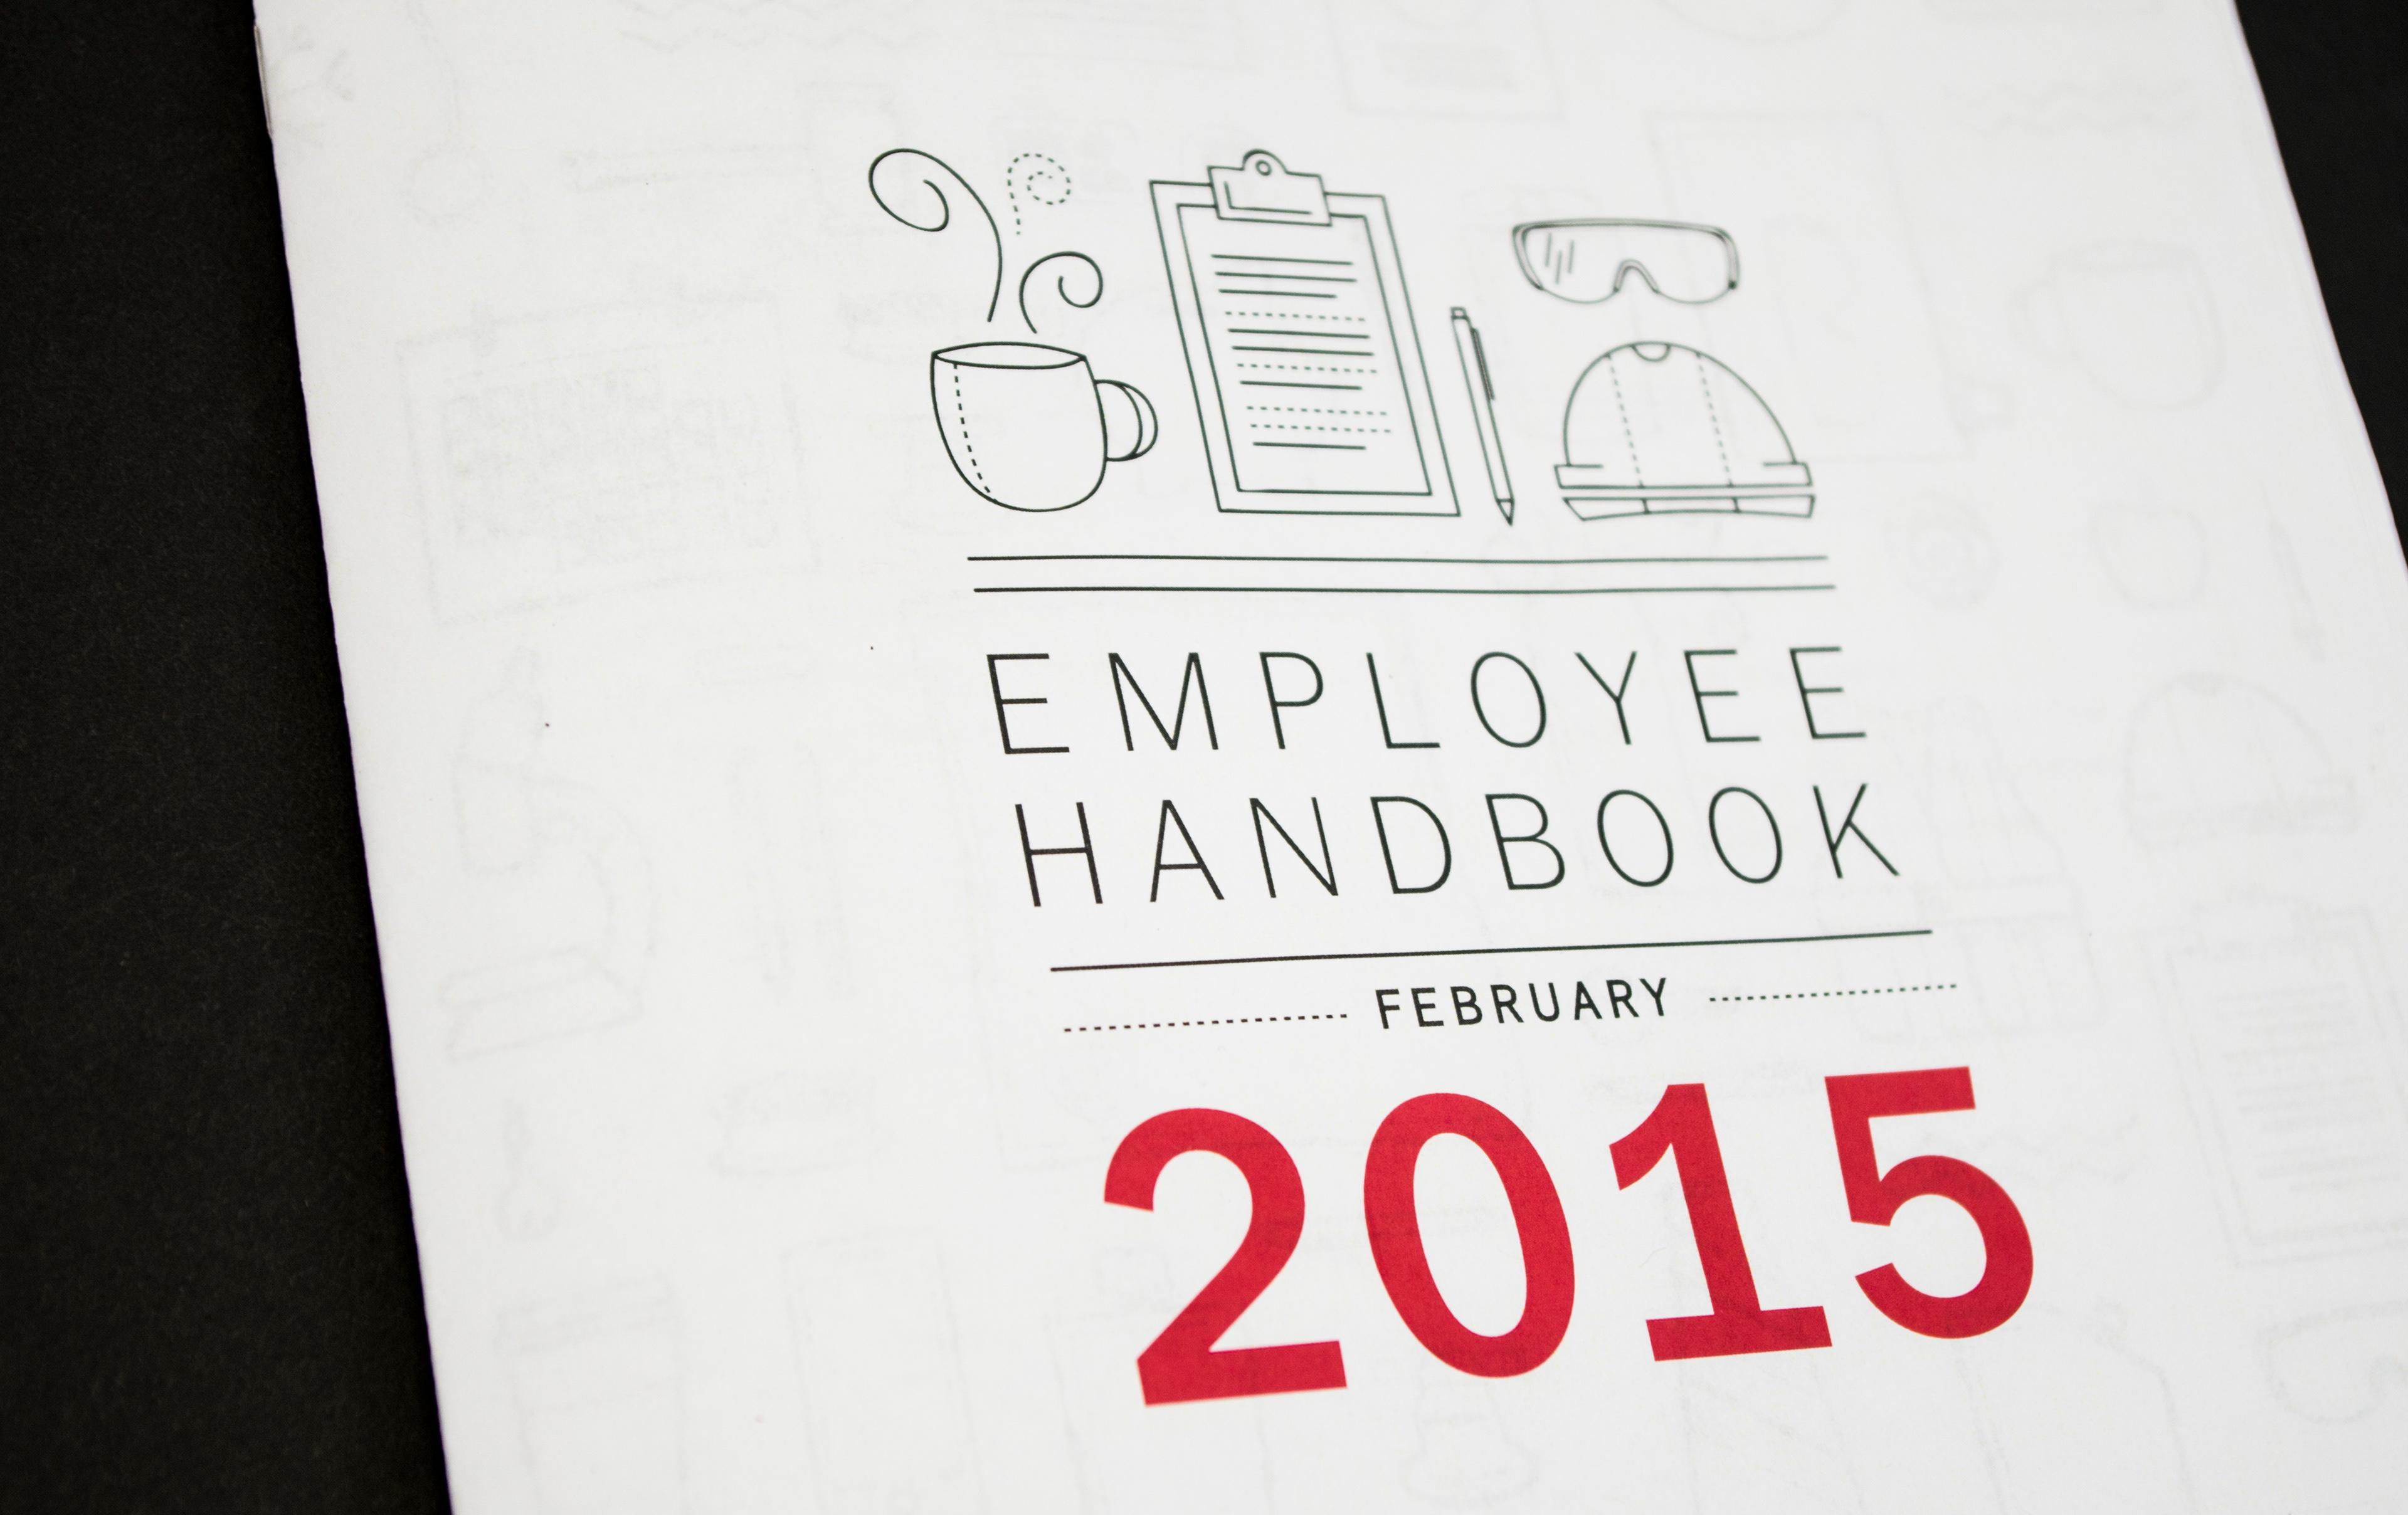 Emily Becker Scholle Employee Handbook - Employee handbook design